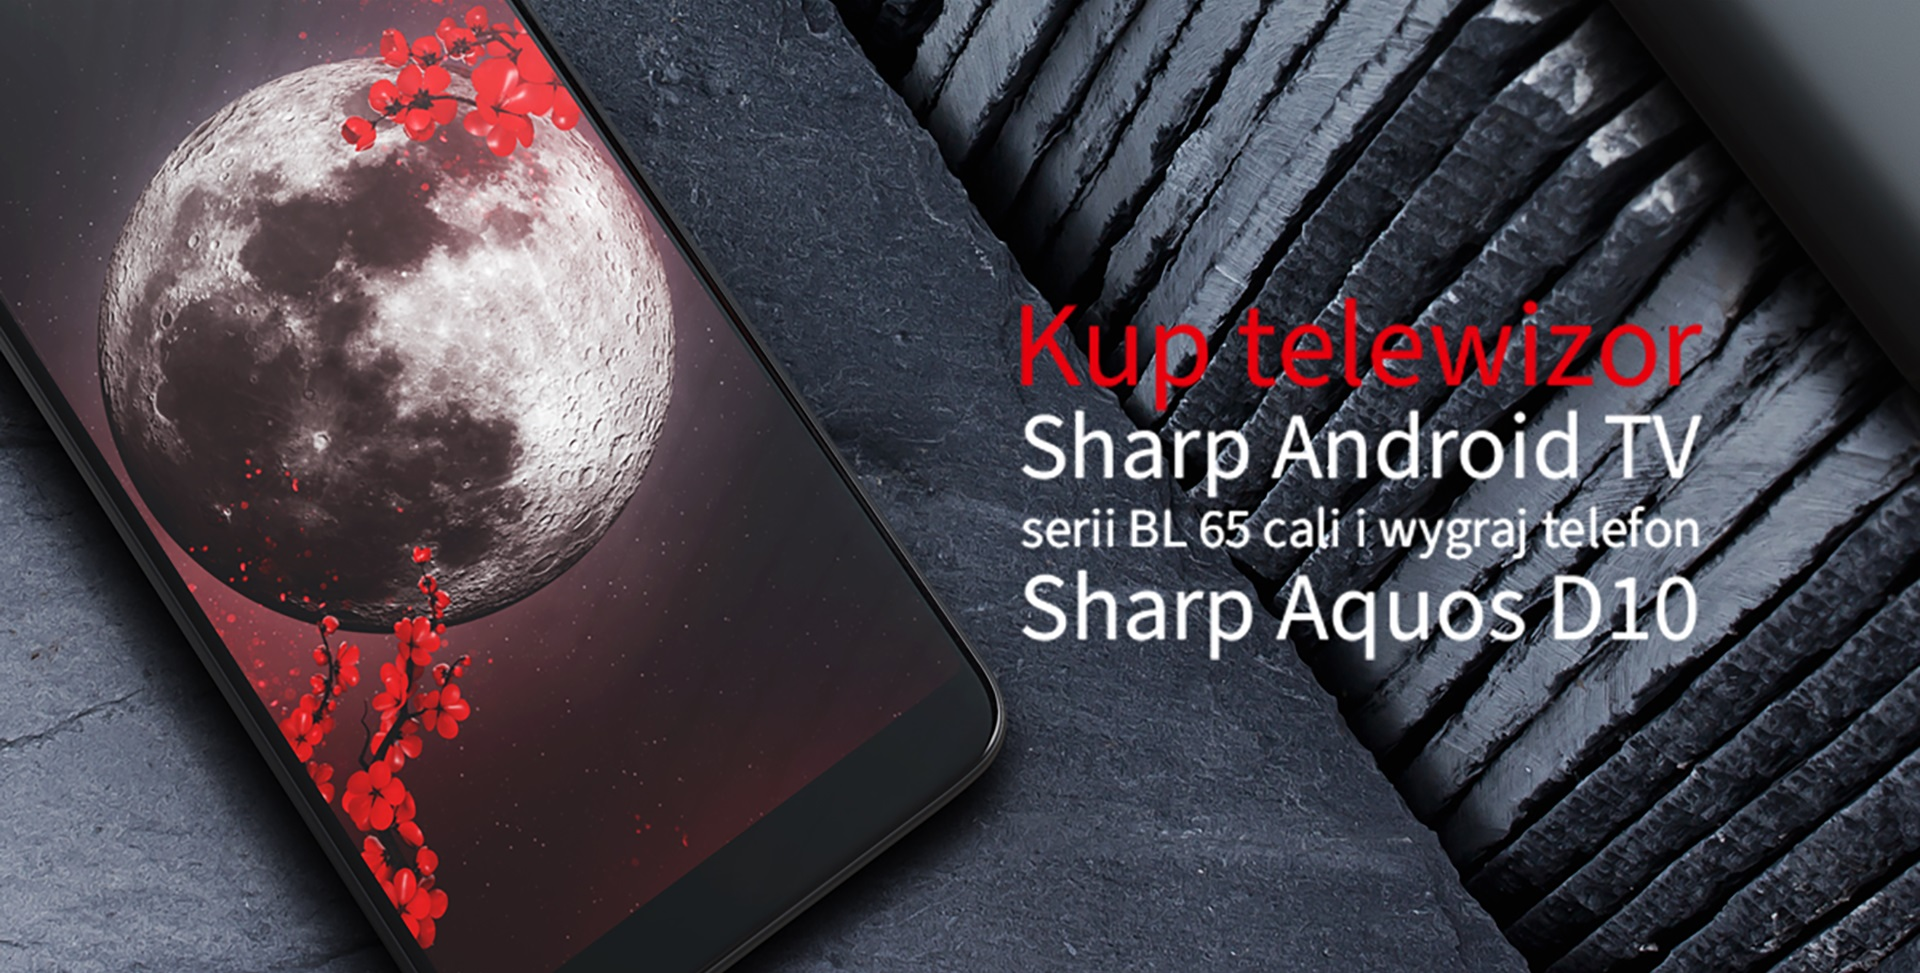 Promocja: kup telewizor Sharp, a dostaniesz smartfon i... drugi telewizor 20